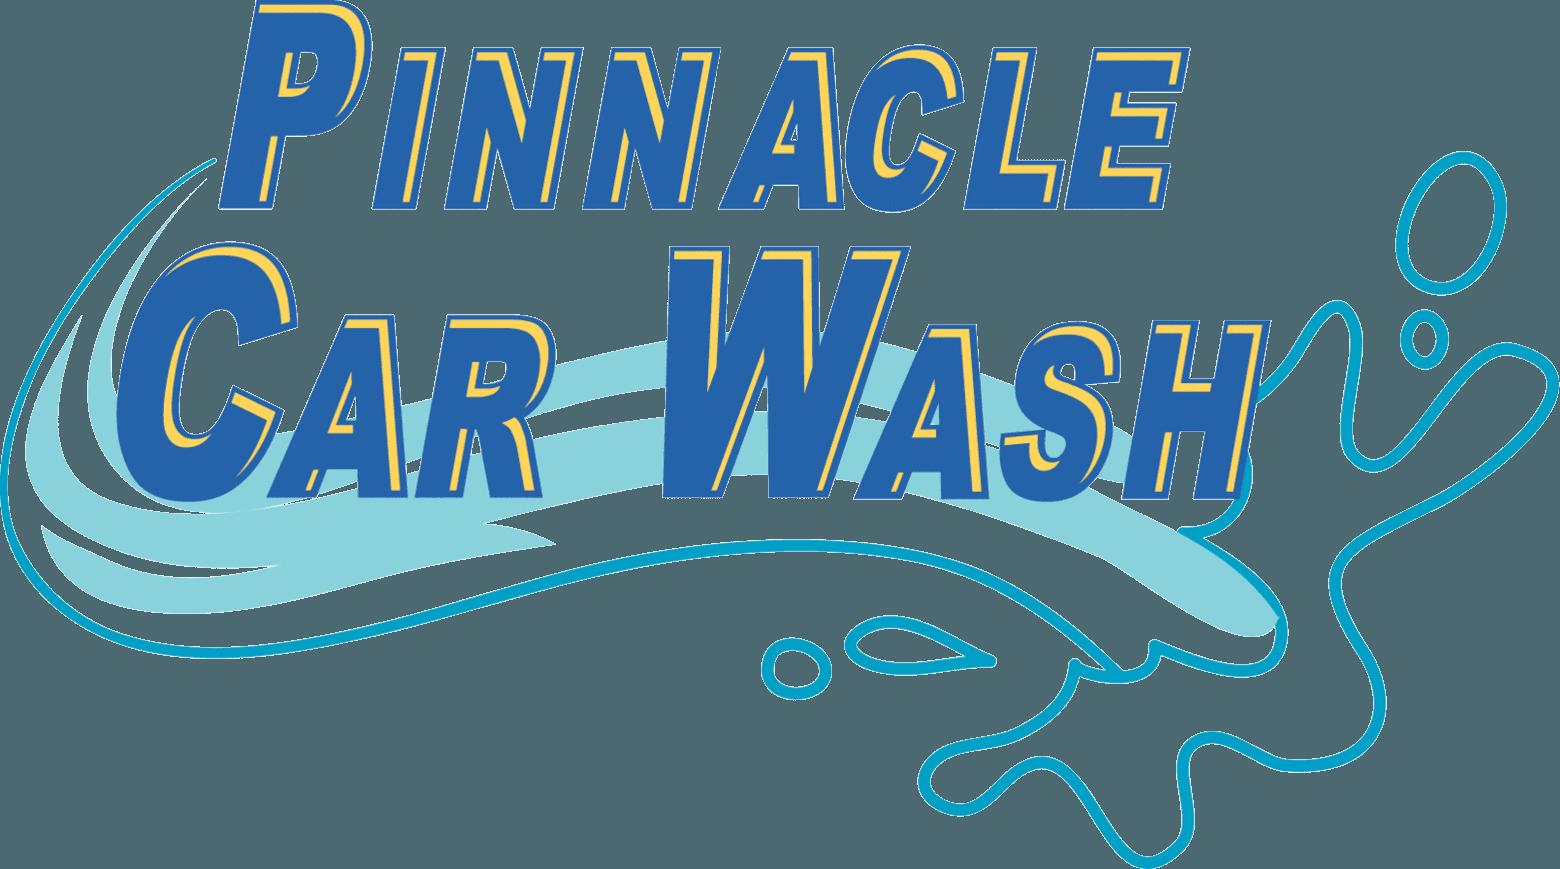 Pinnacle Car Wash Car Wash Gulf Shores AL - Show me nearest car wash